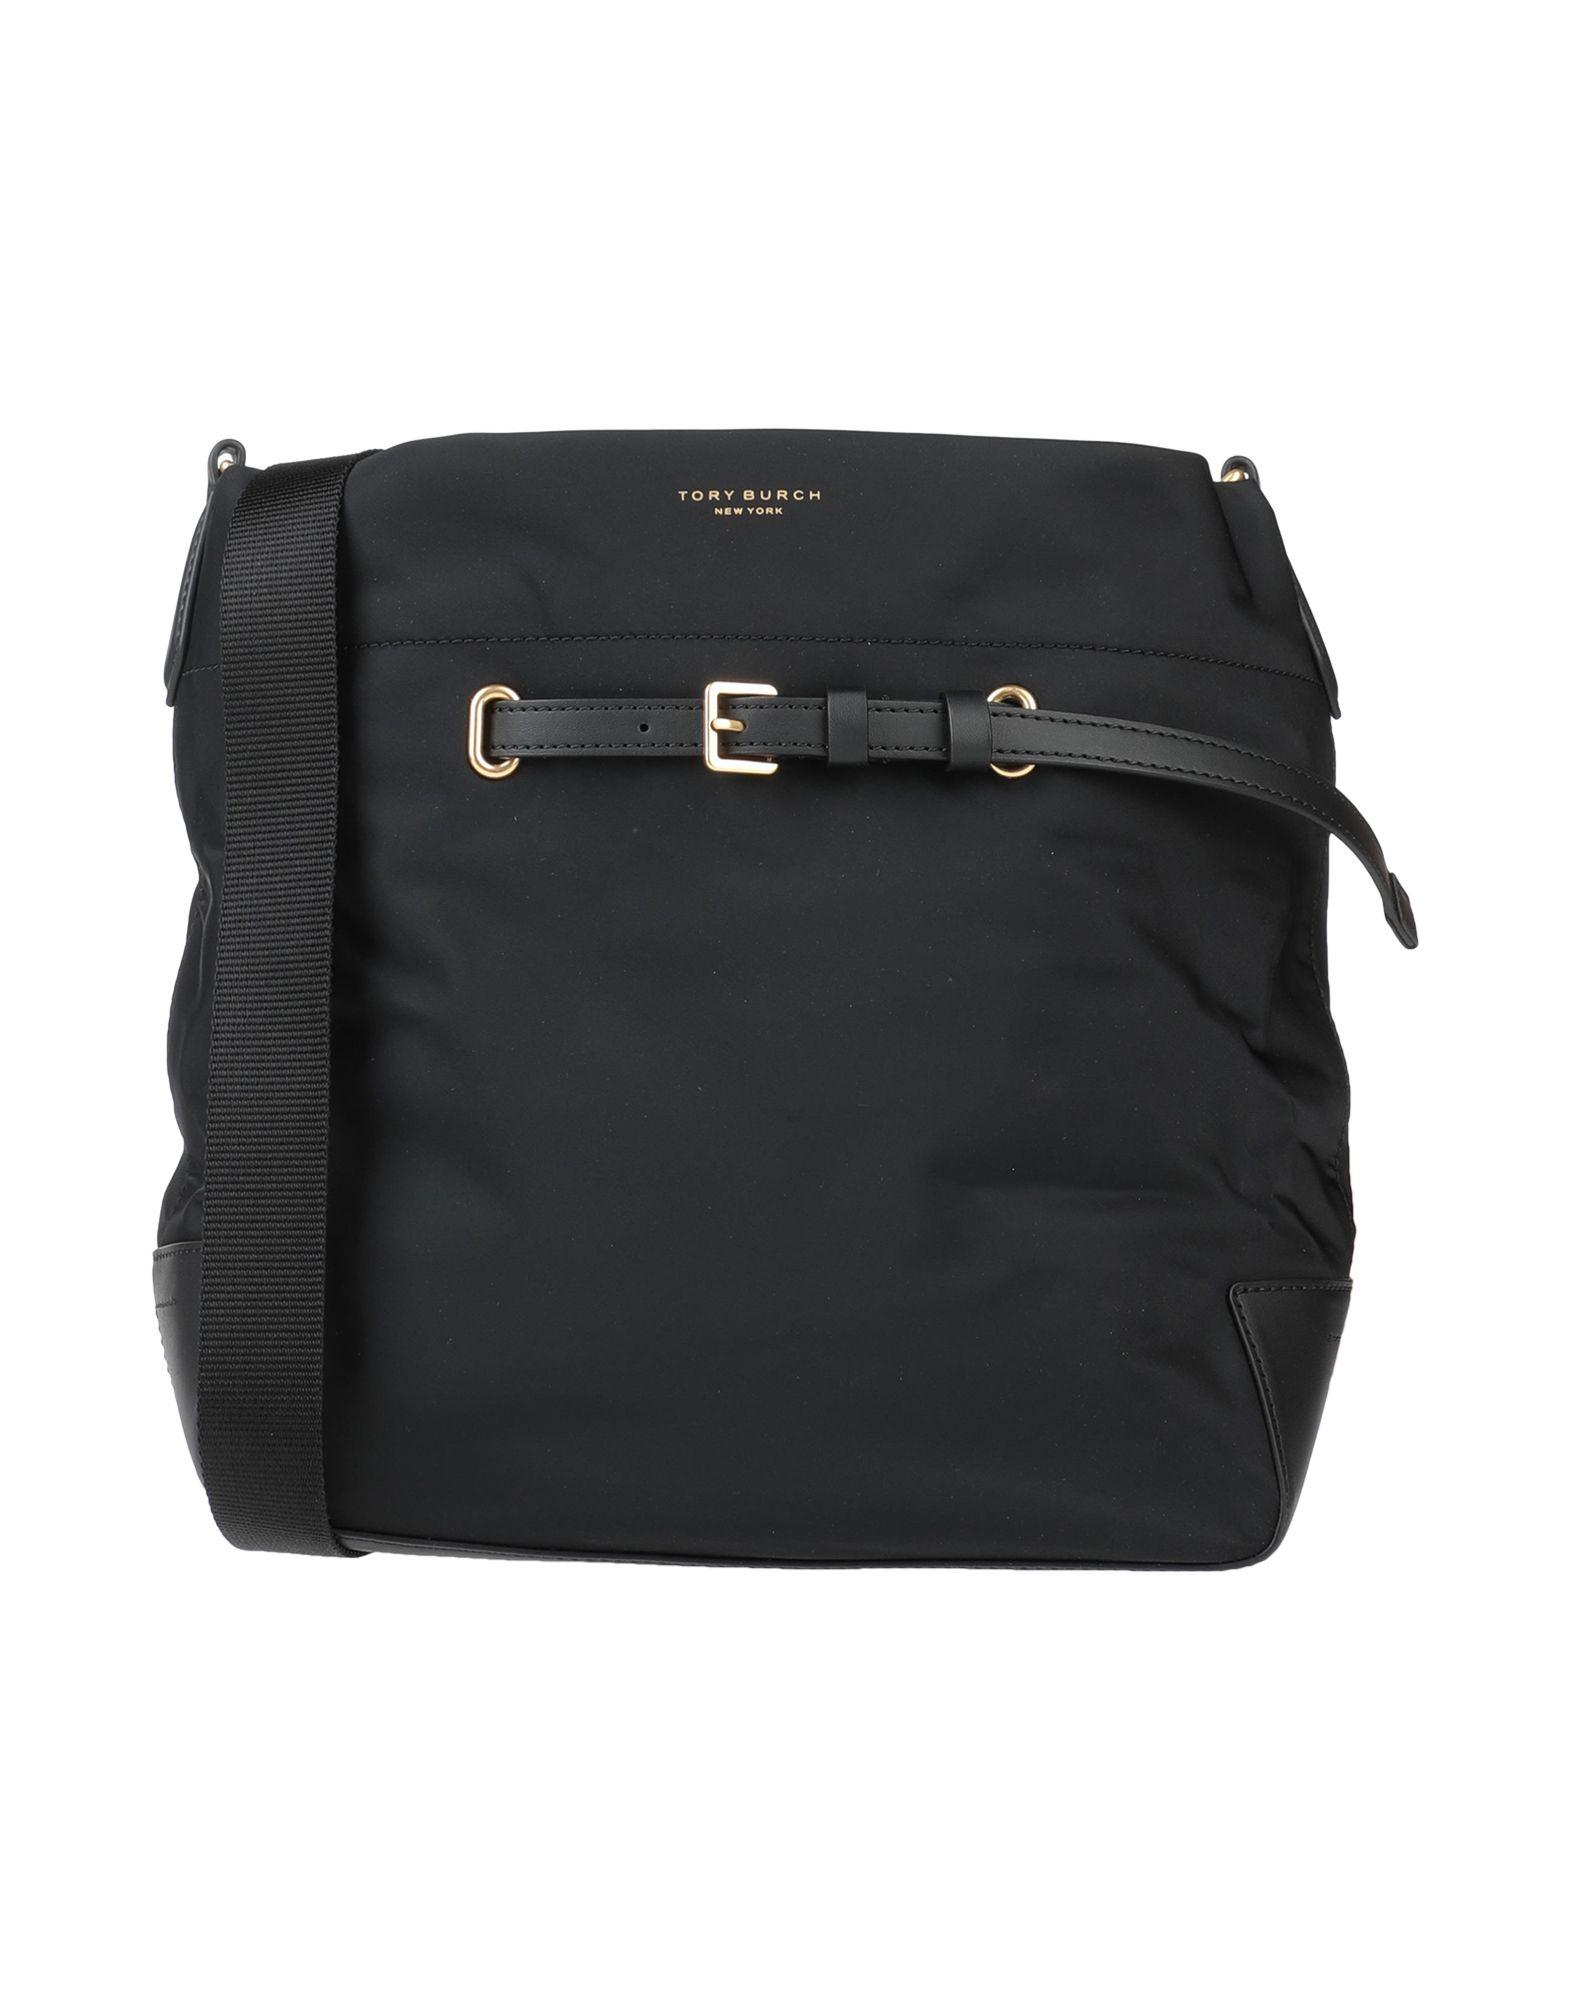 TORY BURCH Cross-body bags - Item 45527259